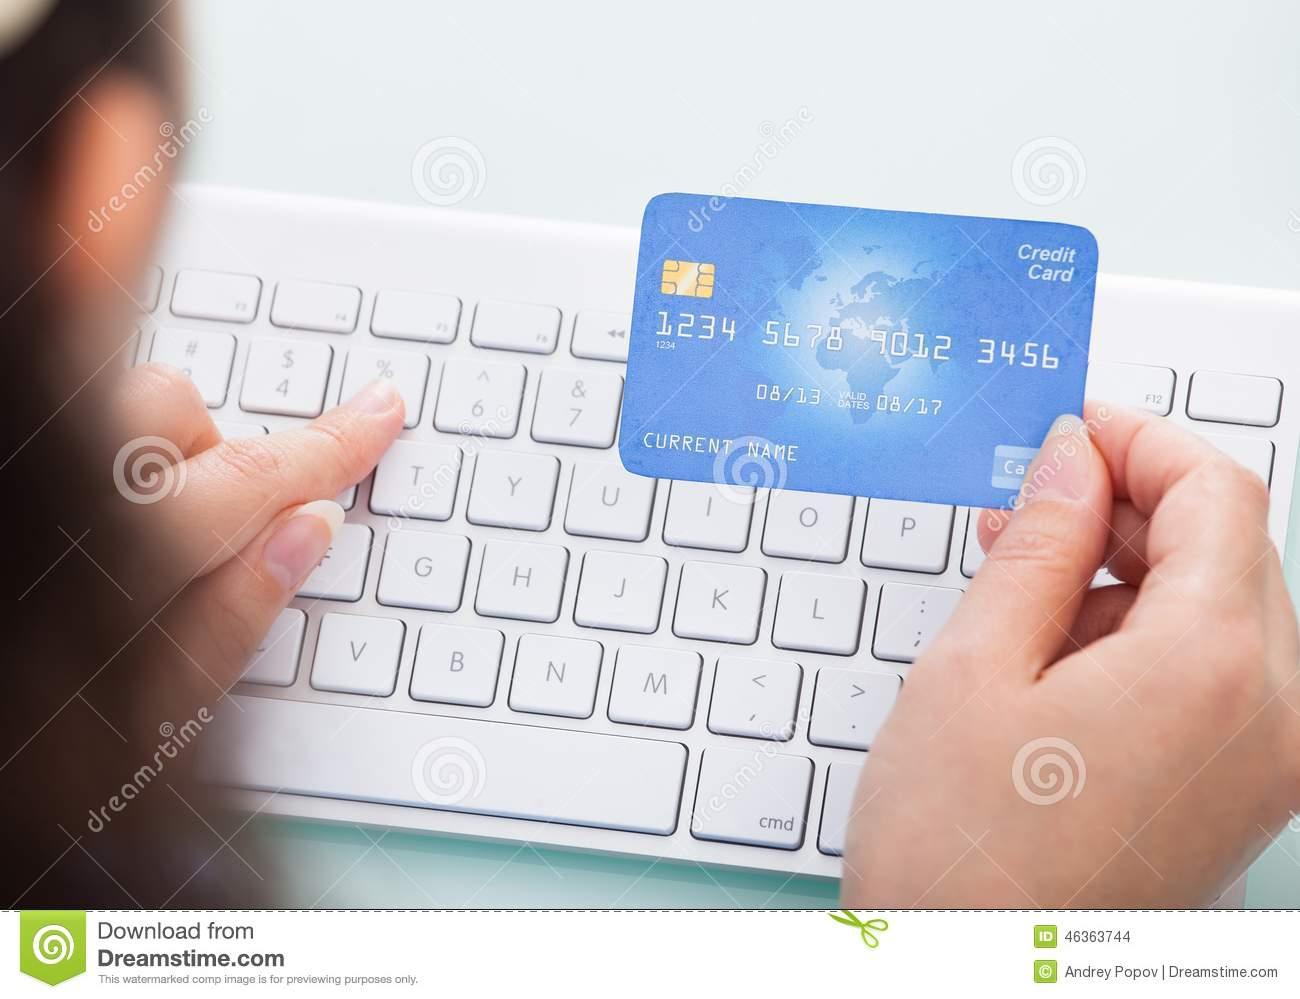 woman entering credit card information